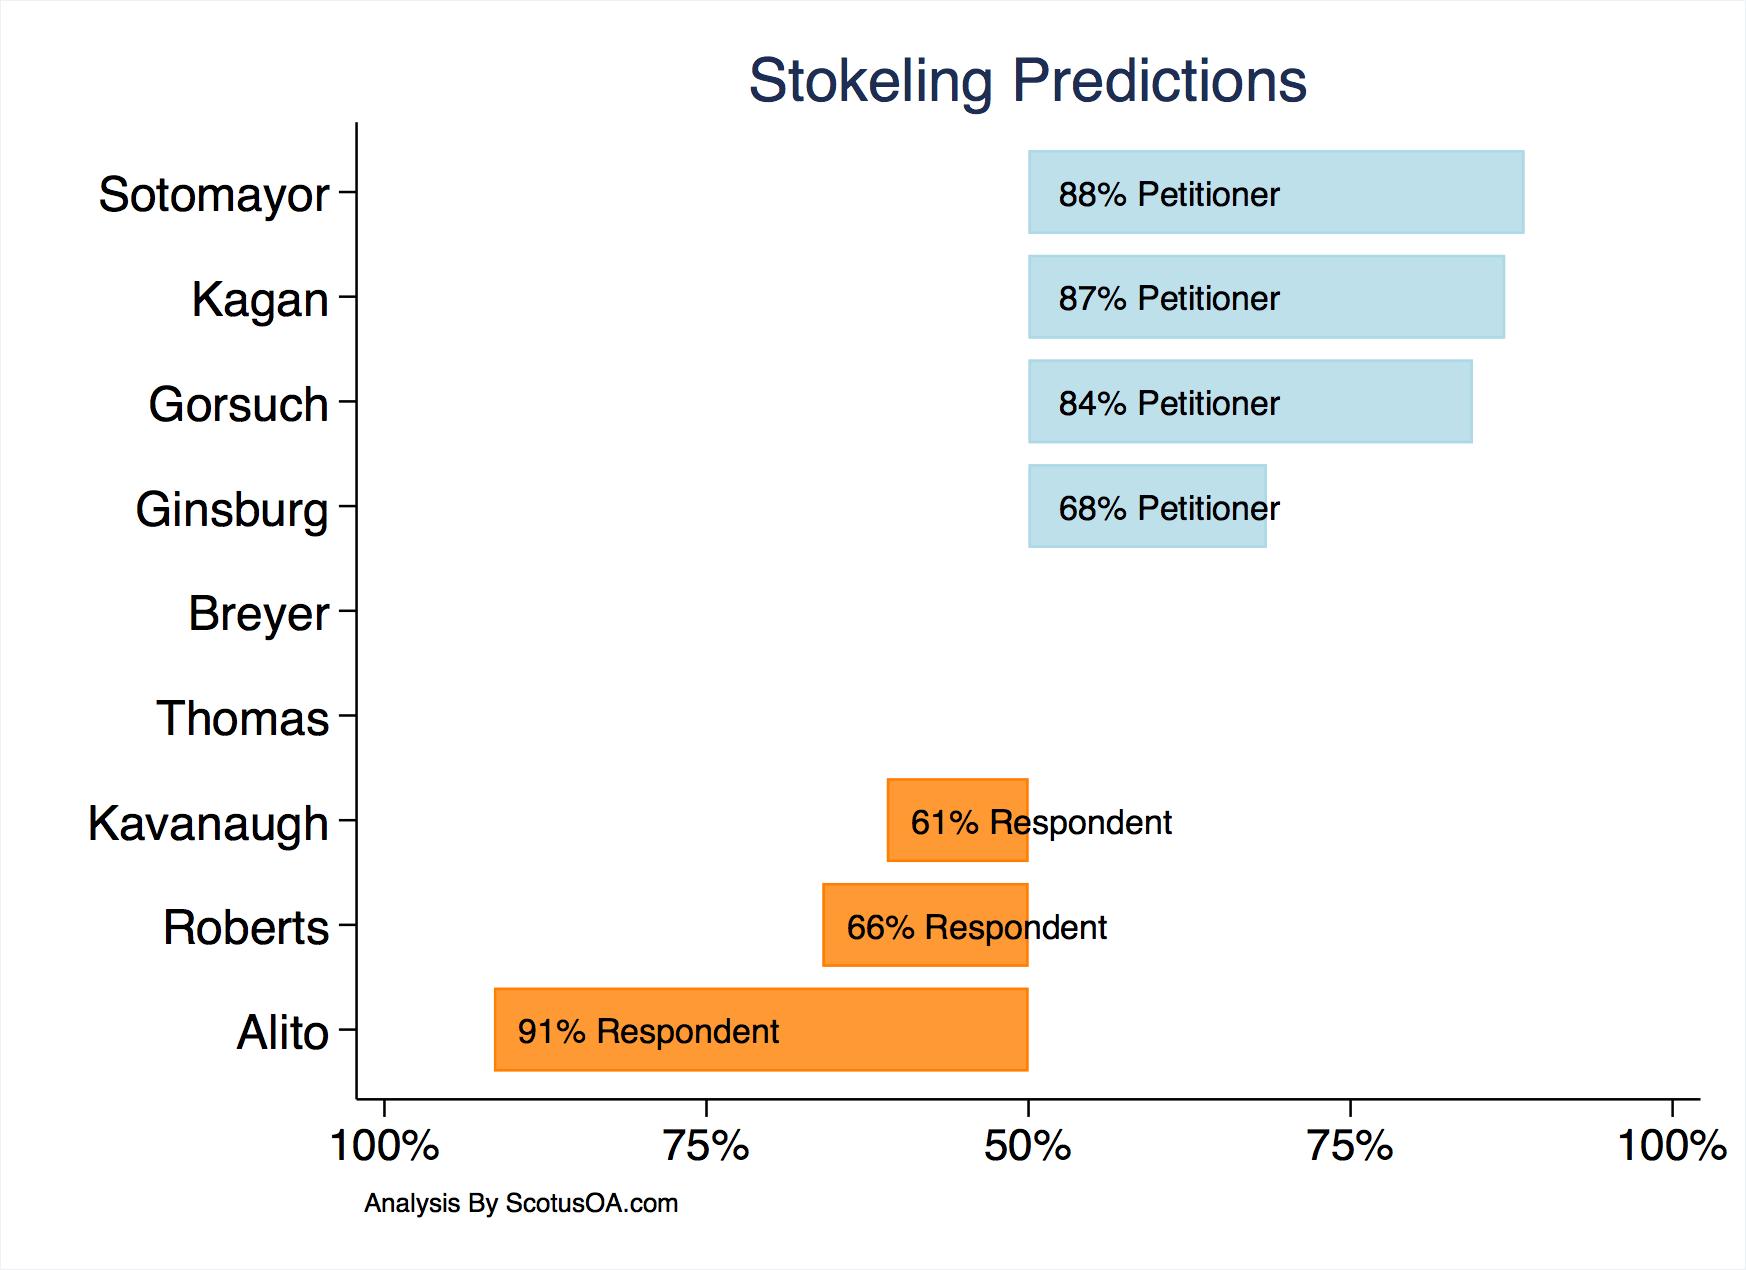 Stokeling V Us Predictions Scotus Oa